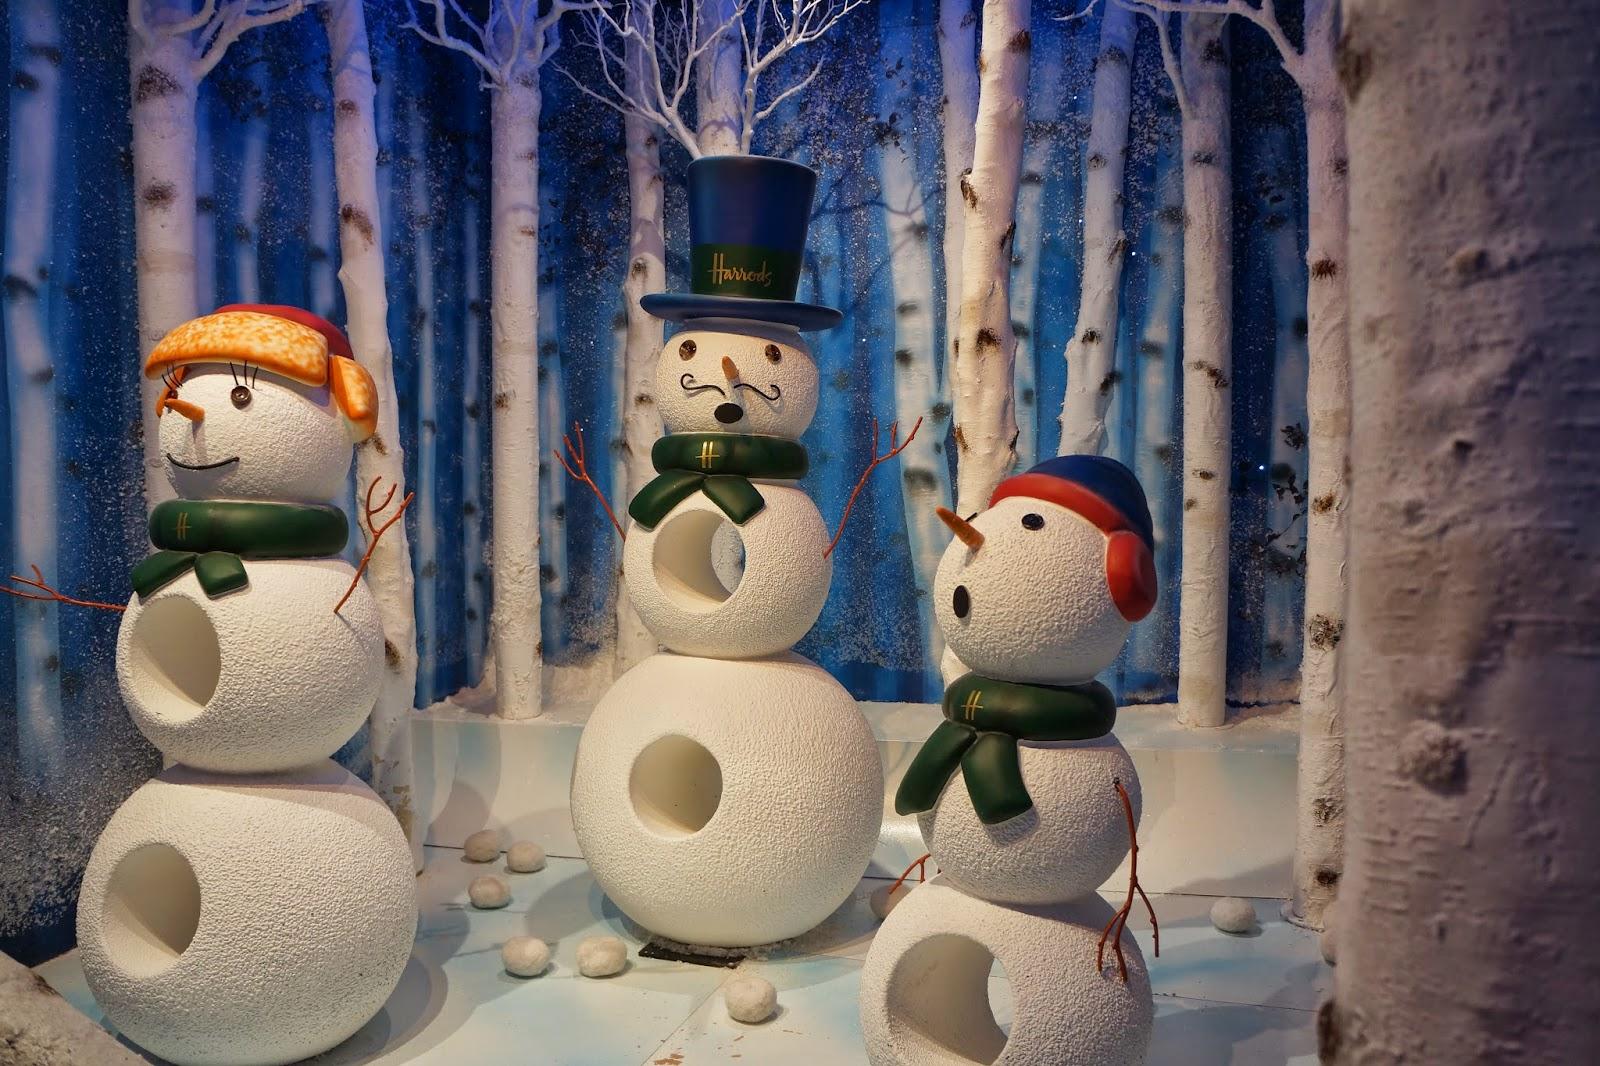 harrods christmas santa's grotto 2014 snowman snowmen